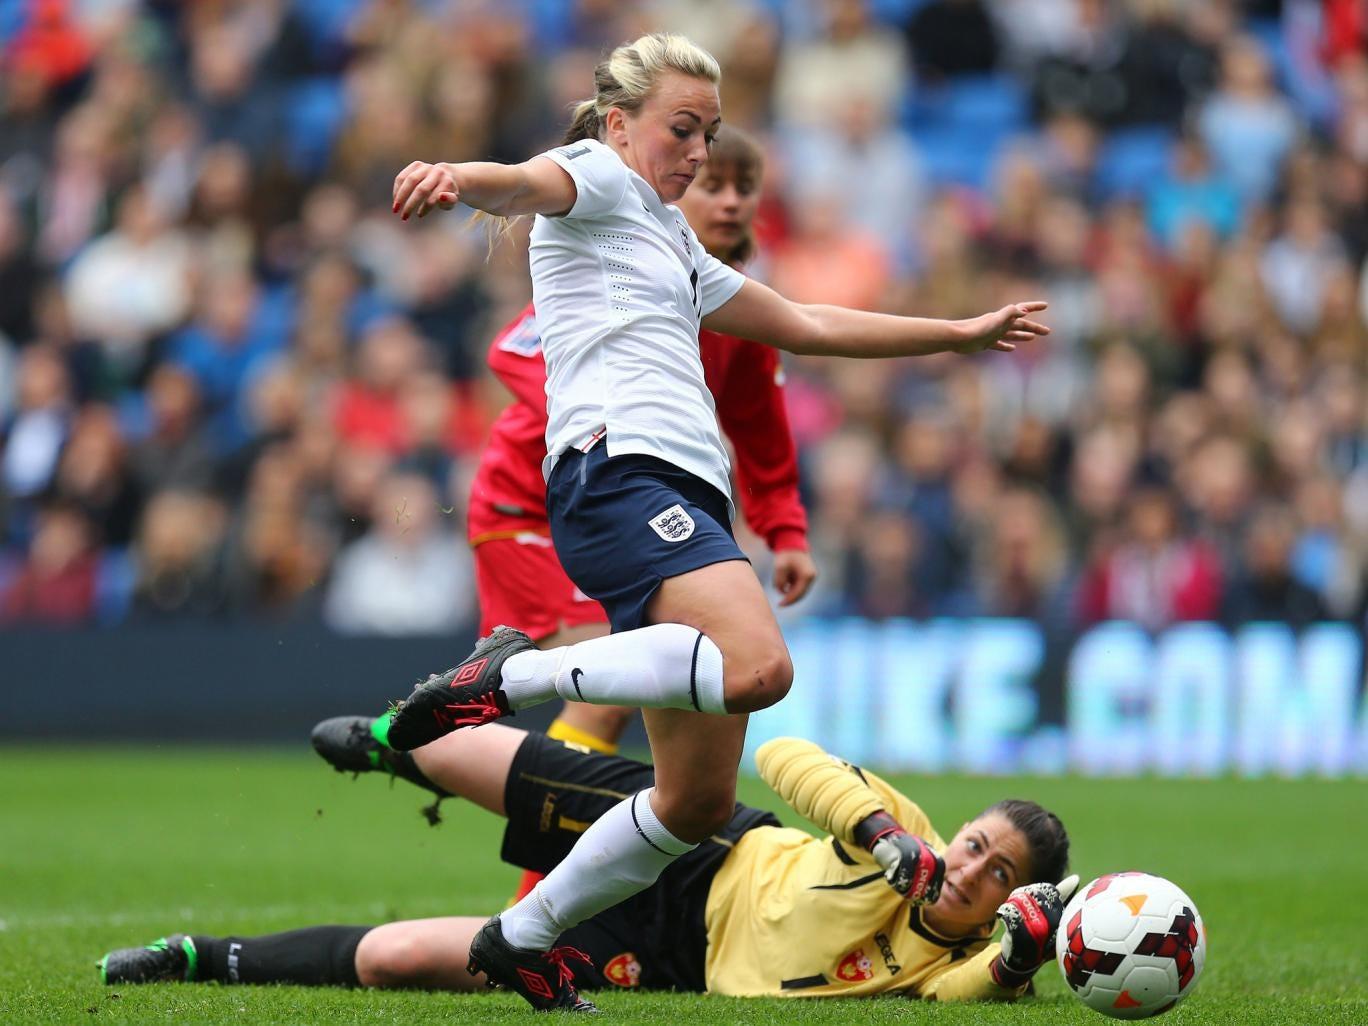 Toni Duggan scores for England Women in the 9-0 win over Montenegro Women